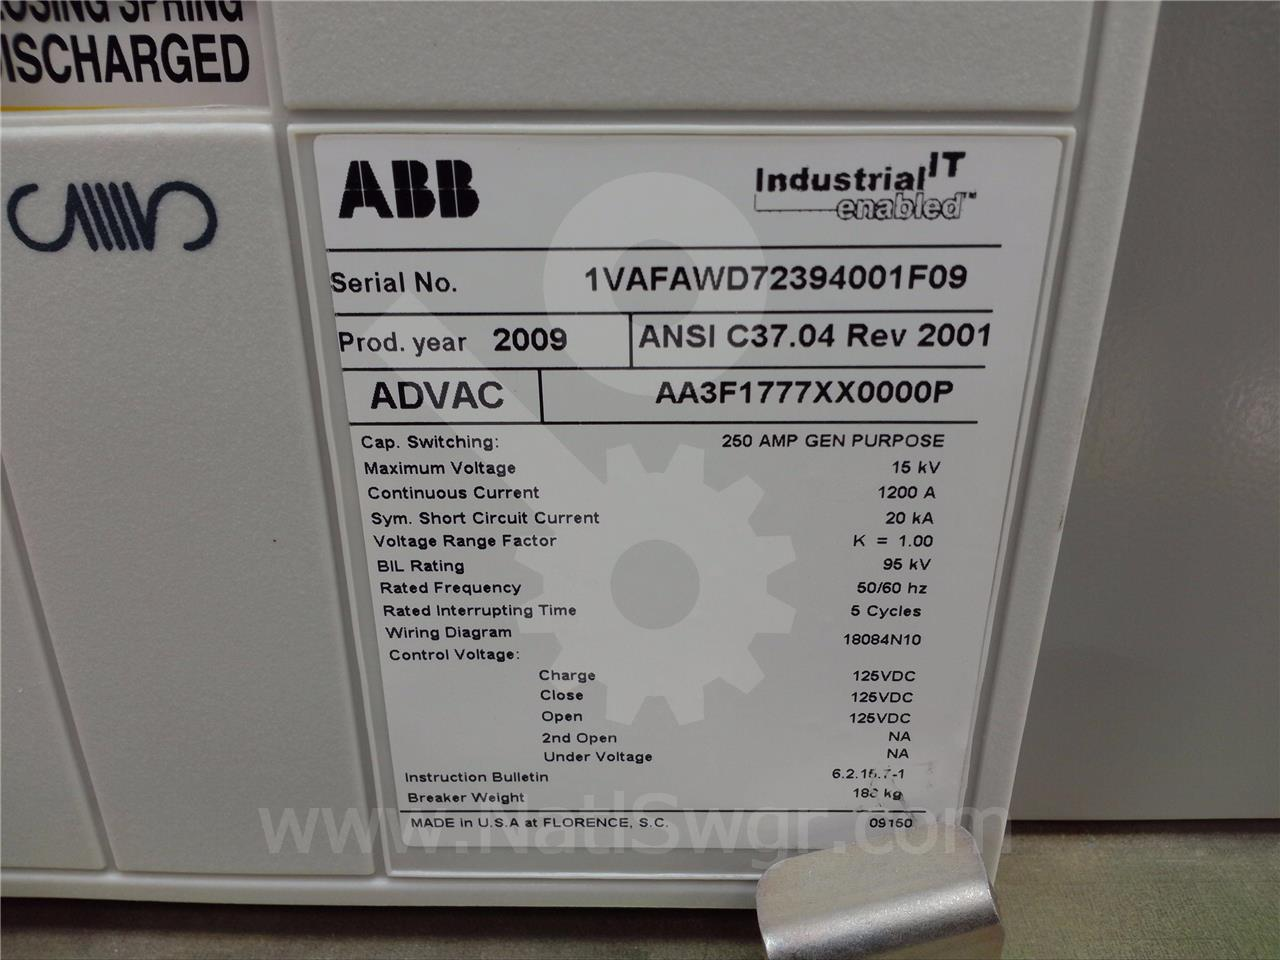 Abb Ite Bbc 1200a Advac Aa3f1777xx0000p Mod 3 2nc Wiring Diagram Mod3 125vdc Control Trip